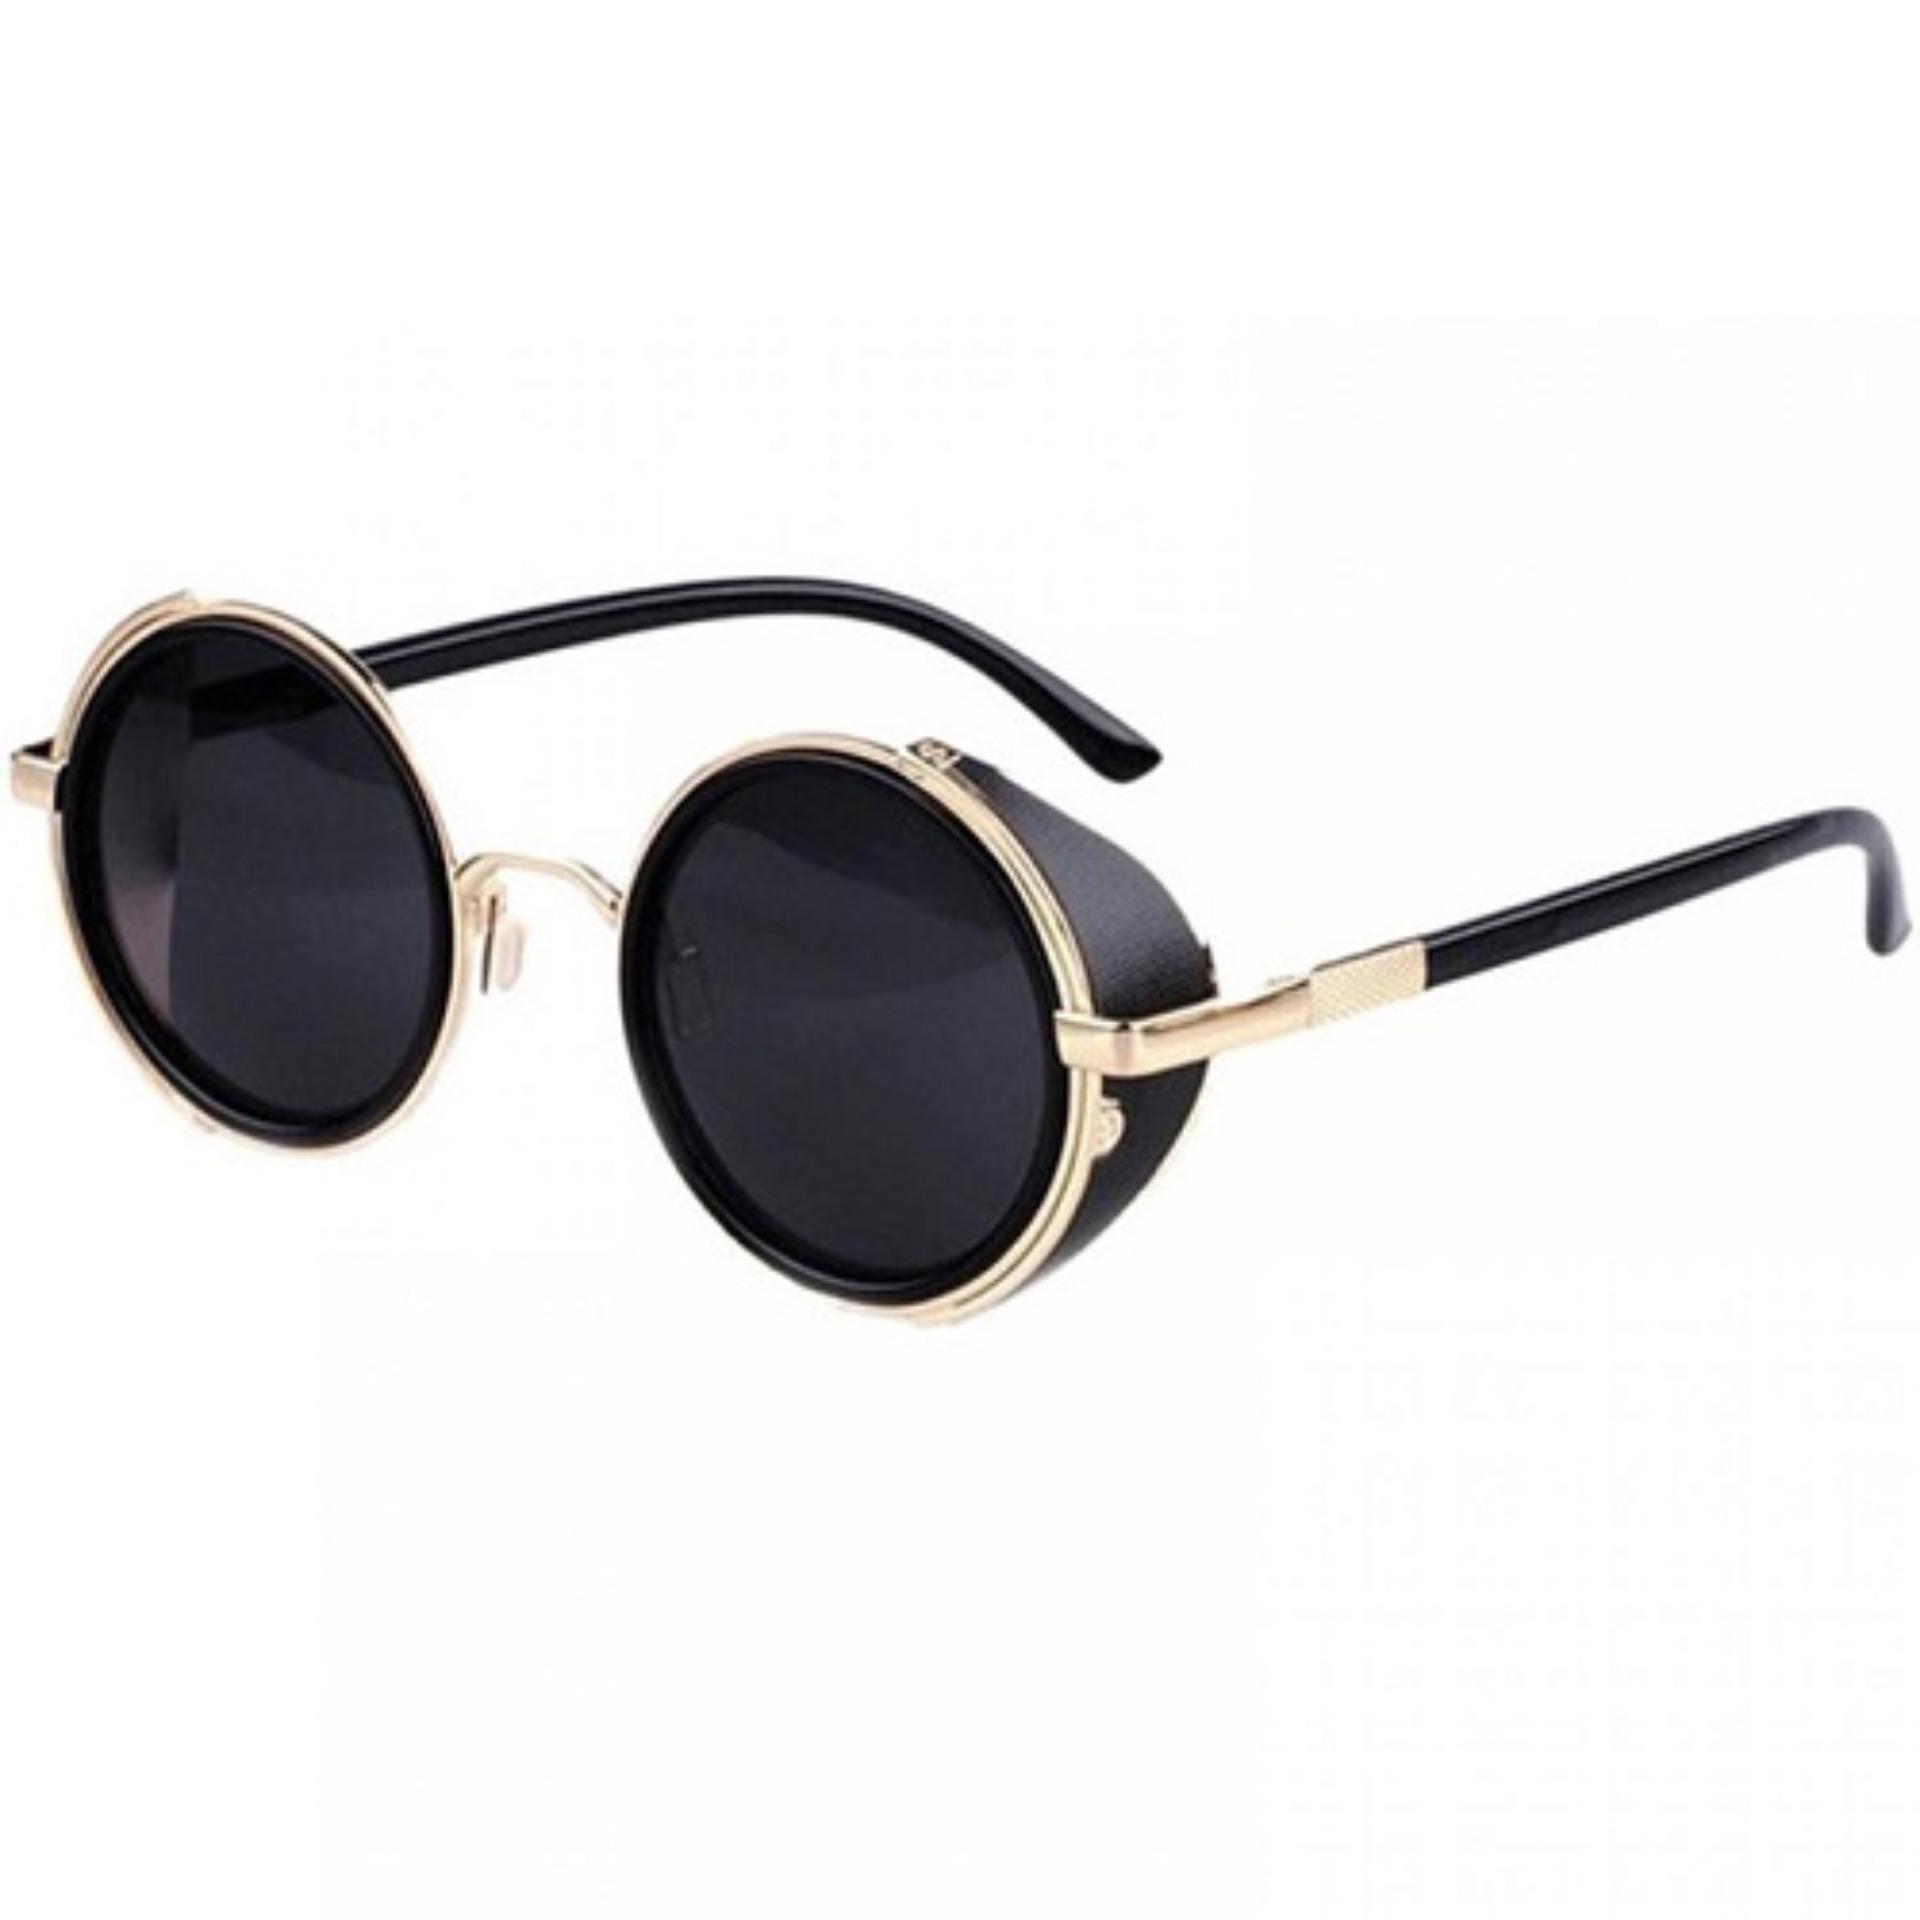 Vintage Kacamata Steampunk Pria & Wanita - Black Gold